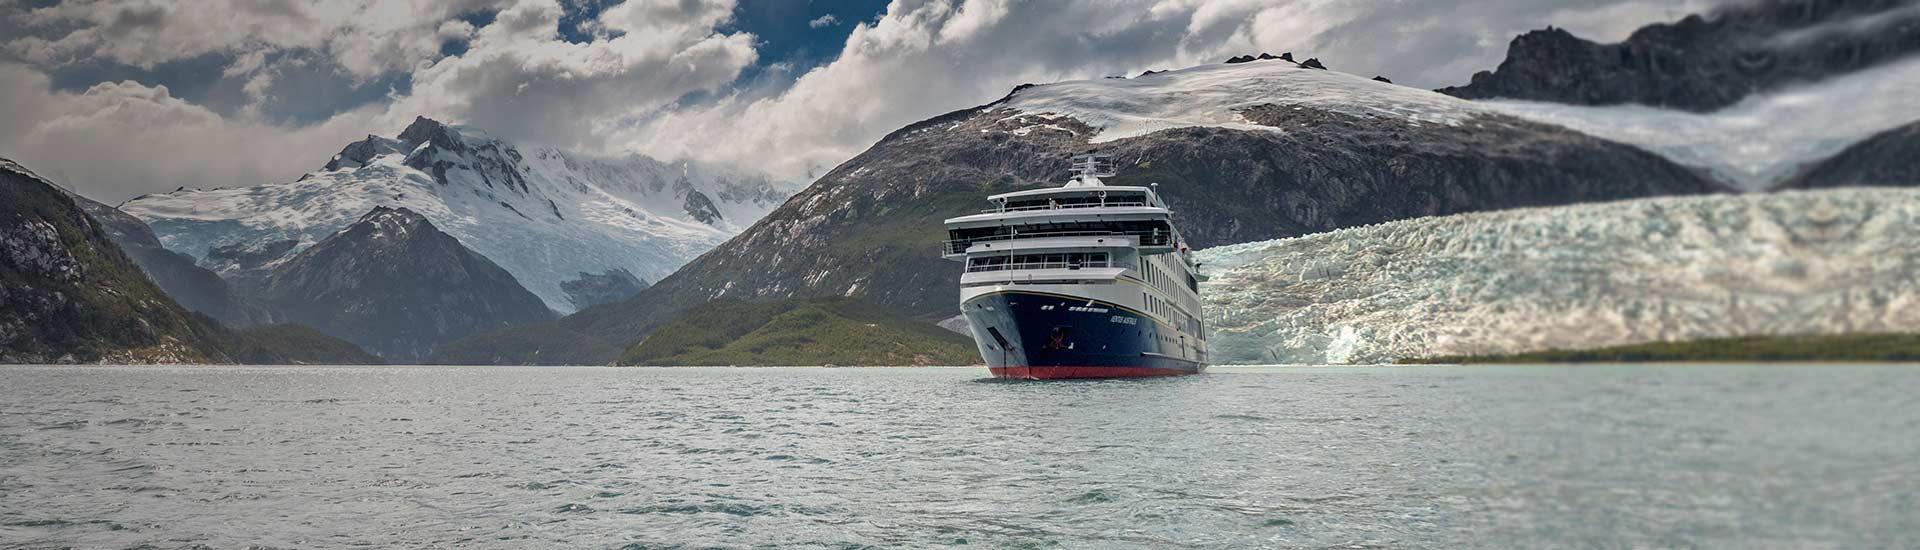 ofertas de viaje Crucero Australis